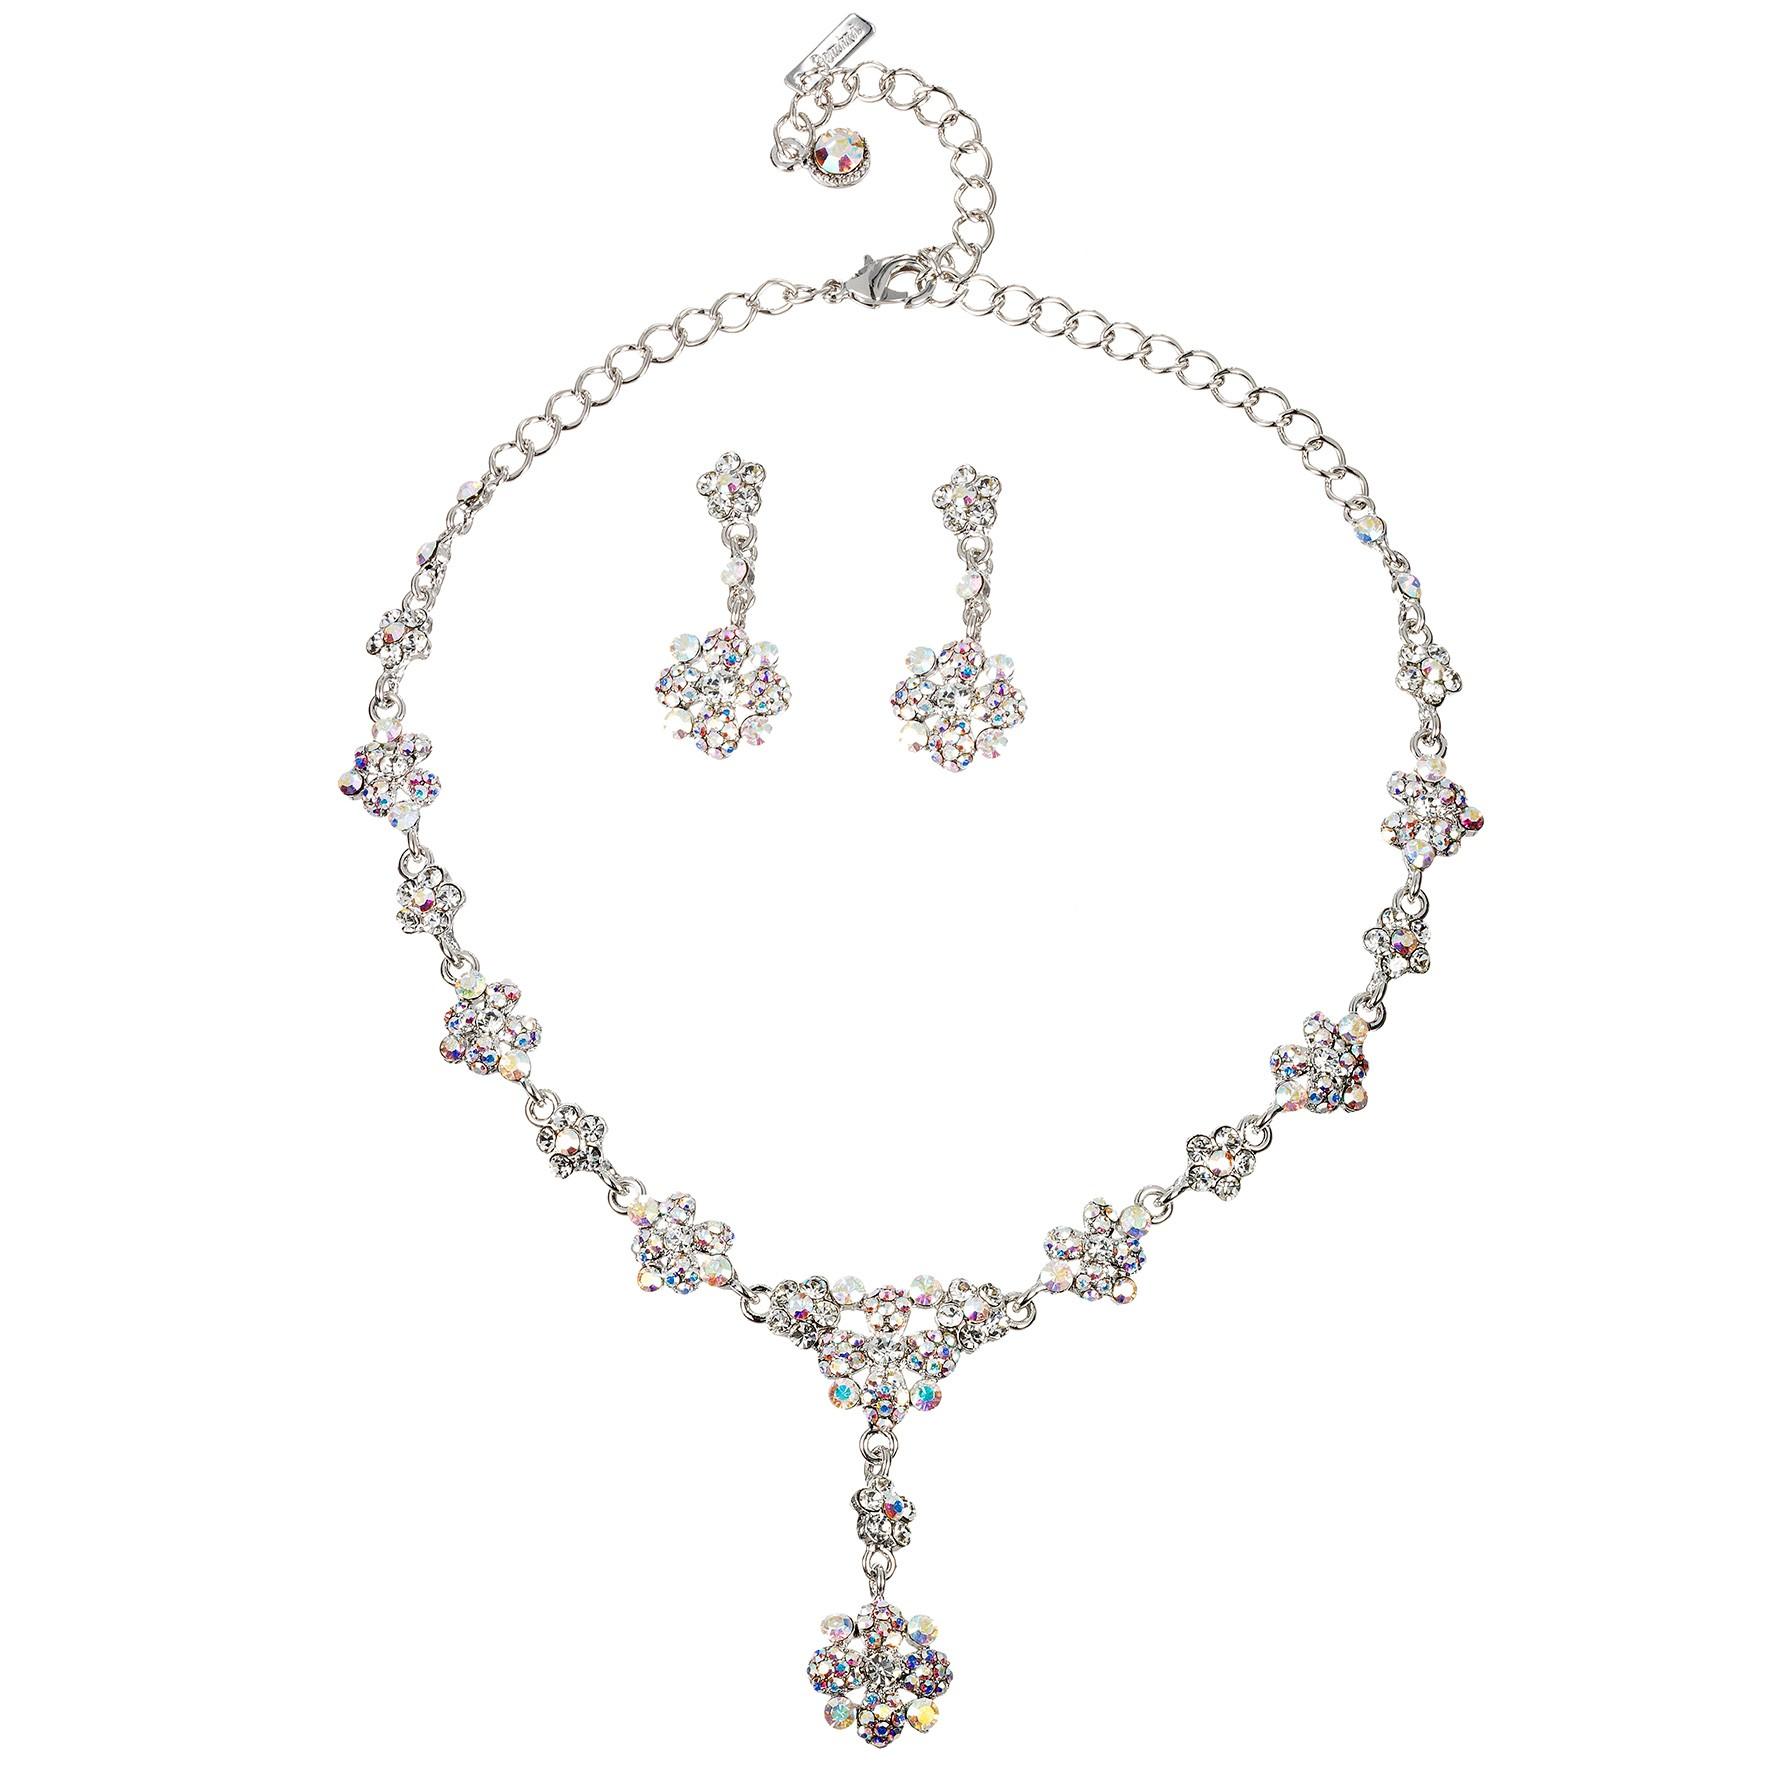 AB Crystal Flower Motif Jewellery Set AB   Clear Swarovski Crystals ... 9f9971e06be8